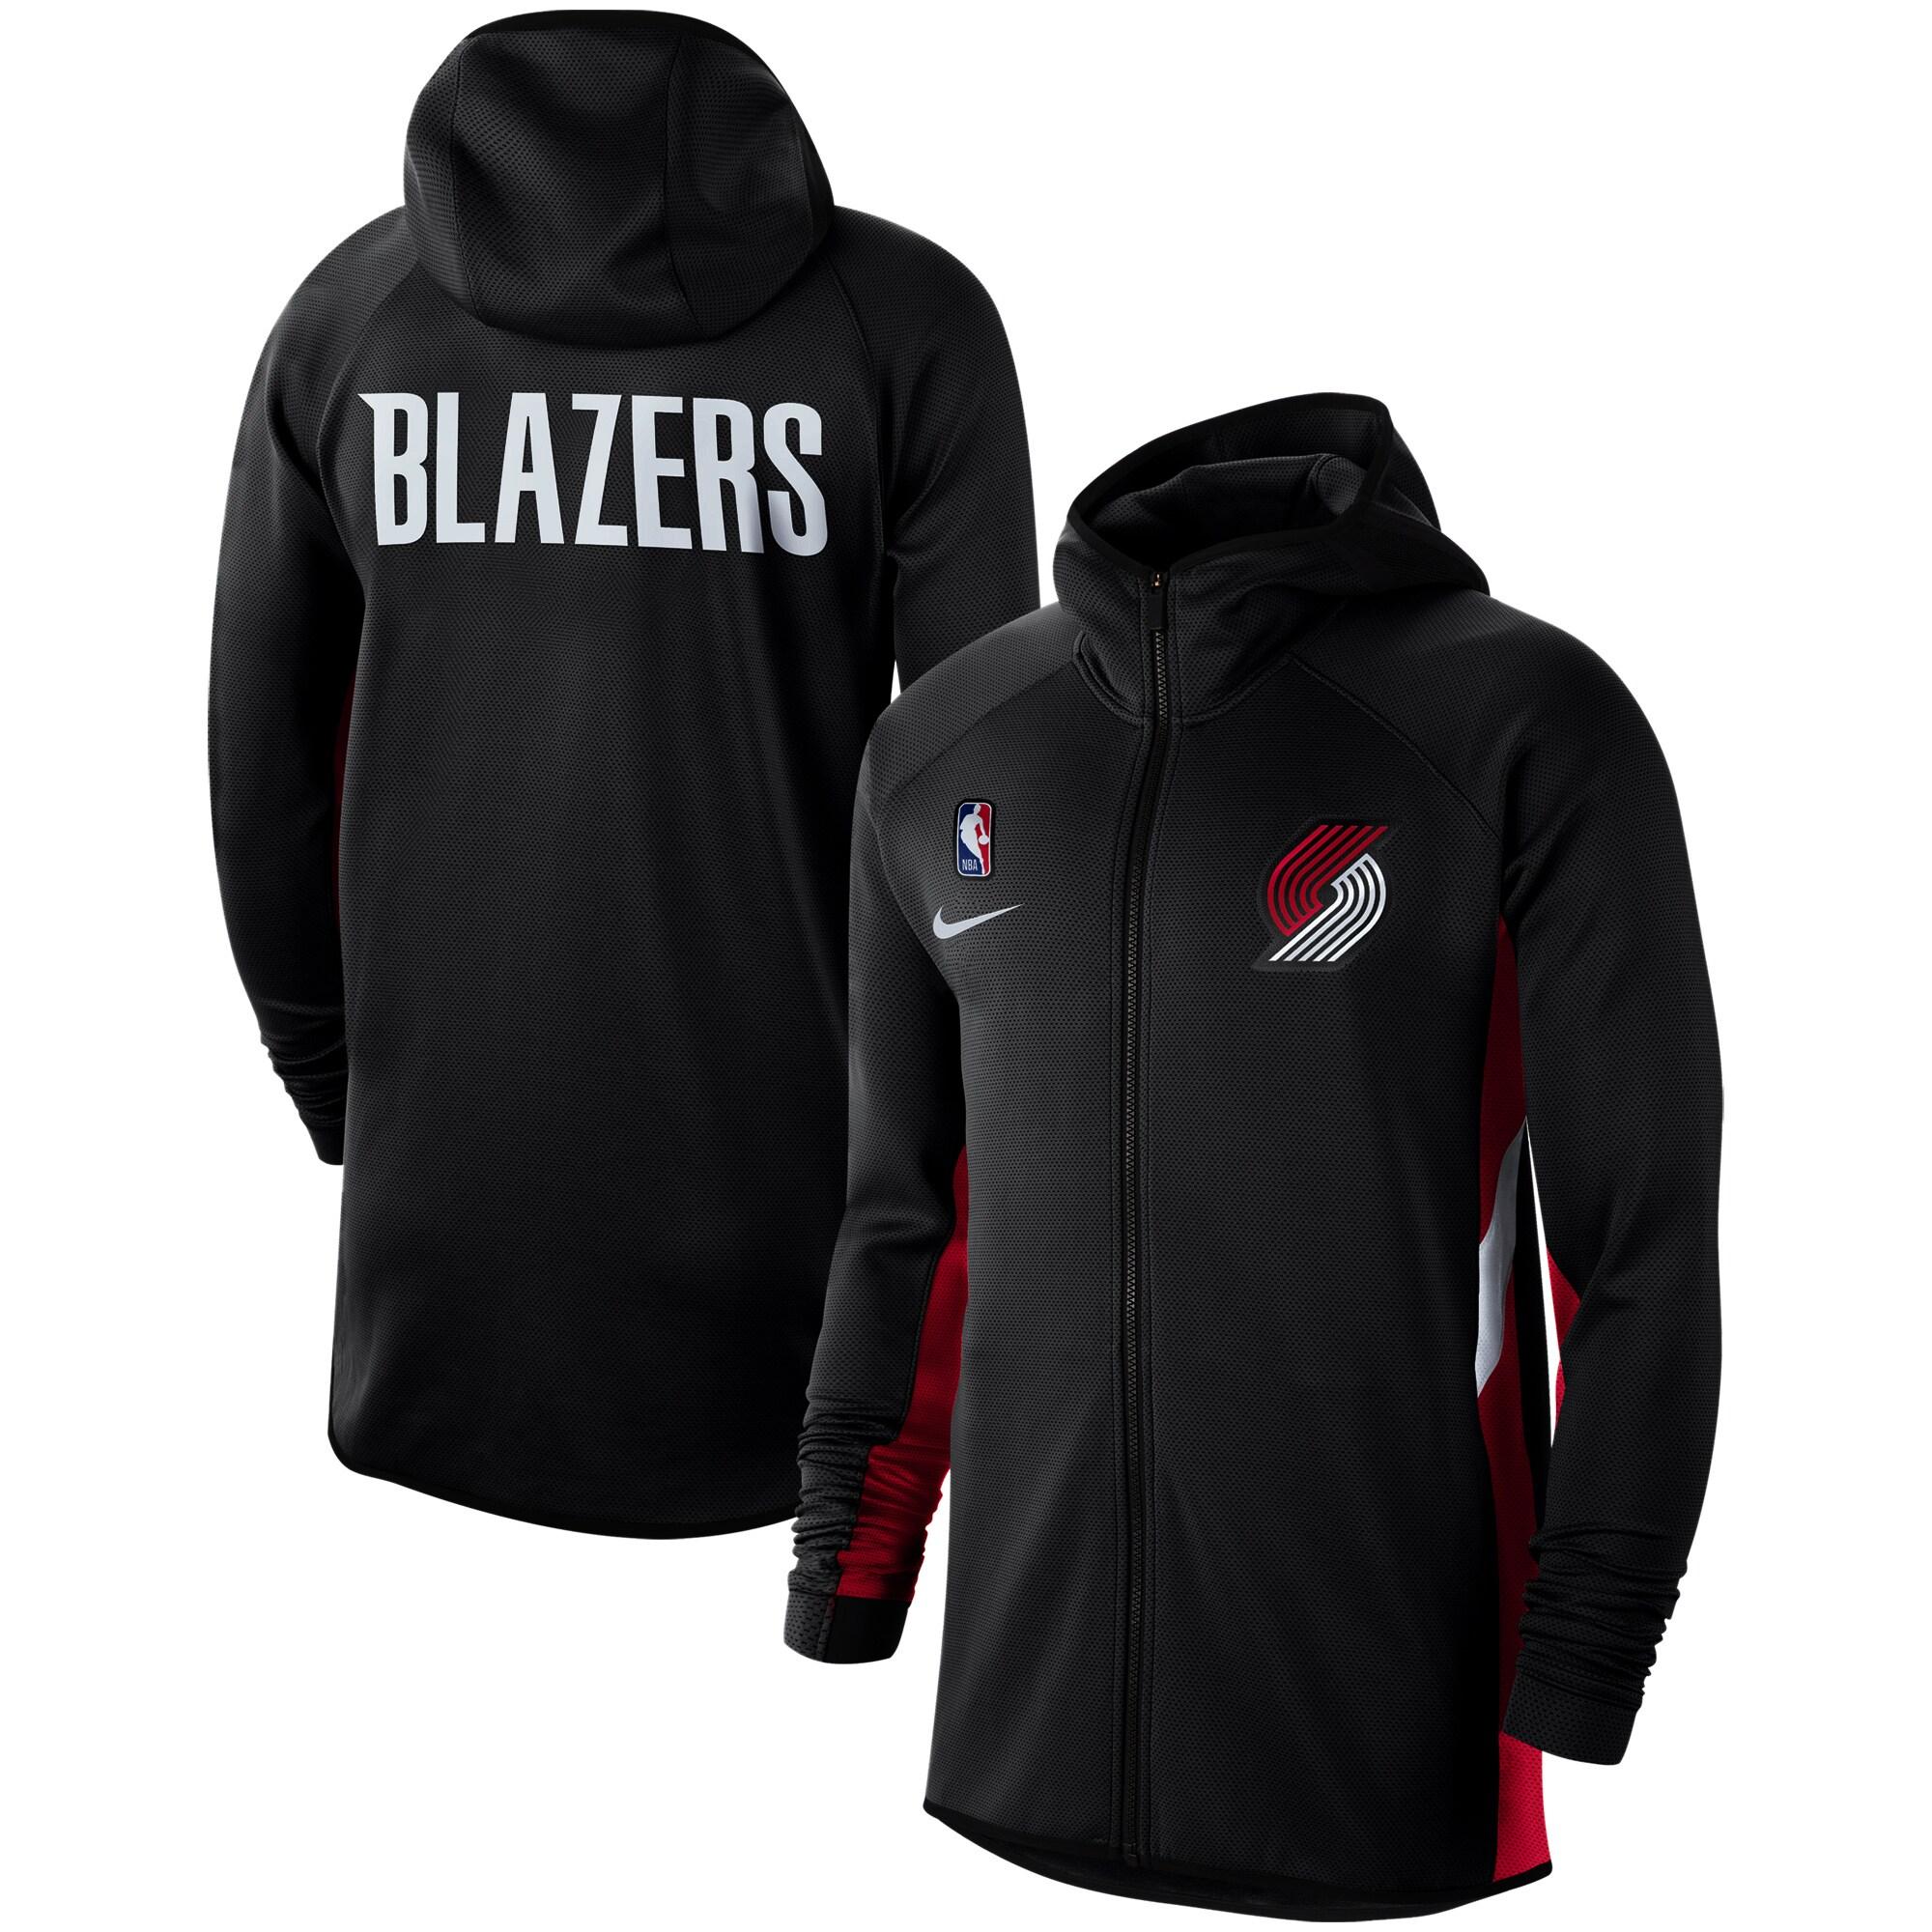 Portland Trail Blazers Nike Authentic Showtime Therma Flex Performance Full-Zip Hoodie - Black